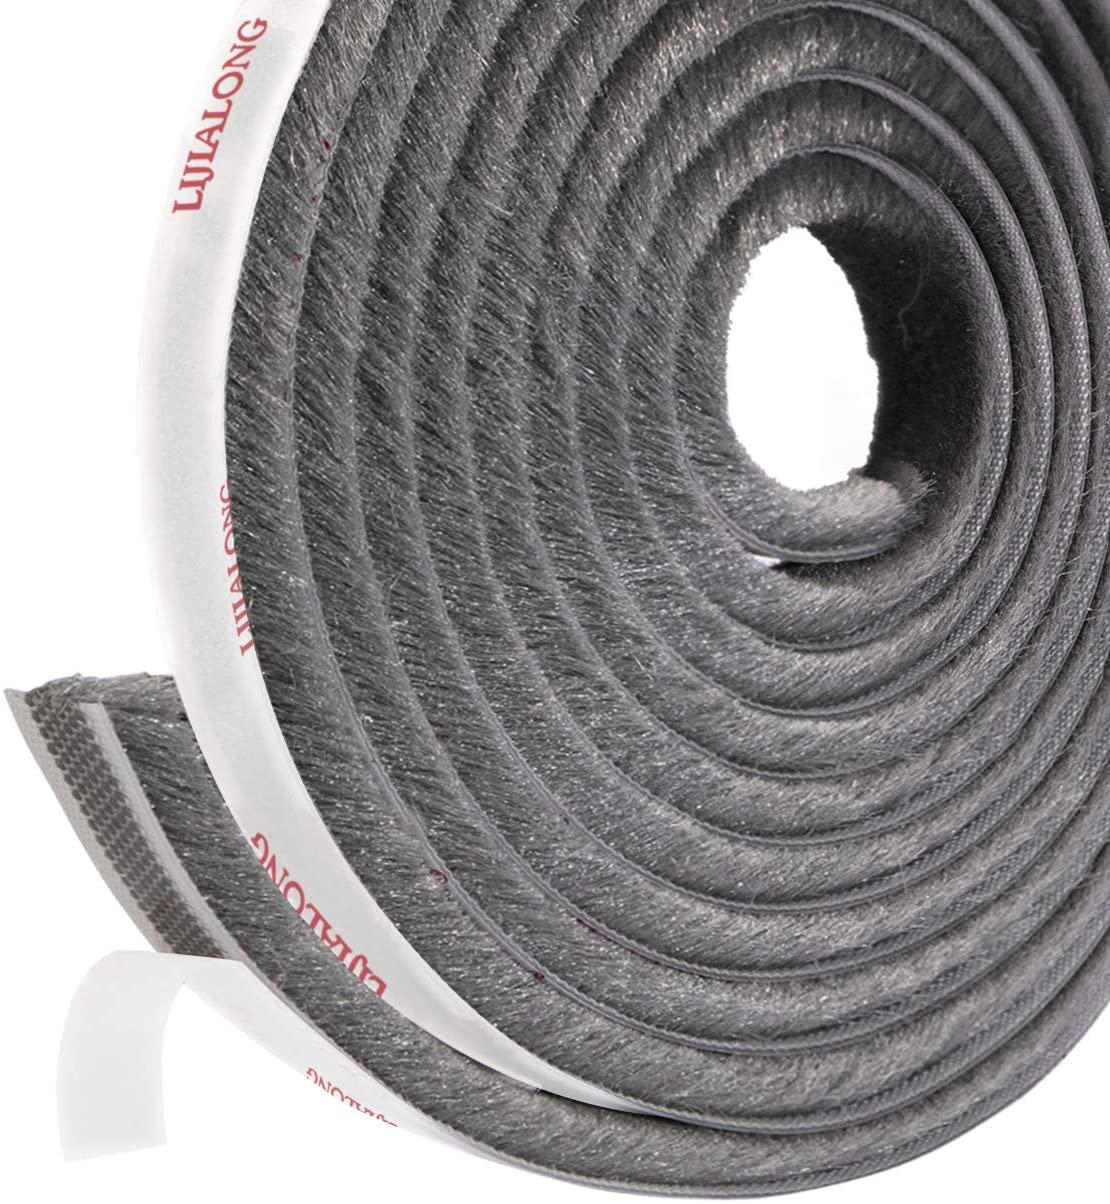 fowong Adhesive Brush Weather Stripping, 11/32 inch x 3/16 inch x 16 Feet, High Density Felt Door Brush Strip for Sliding Sash Door Window Wardrobe Seal (Grey)